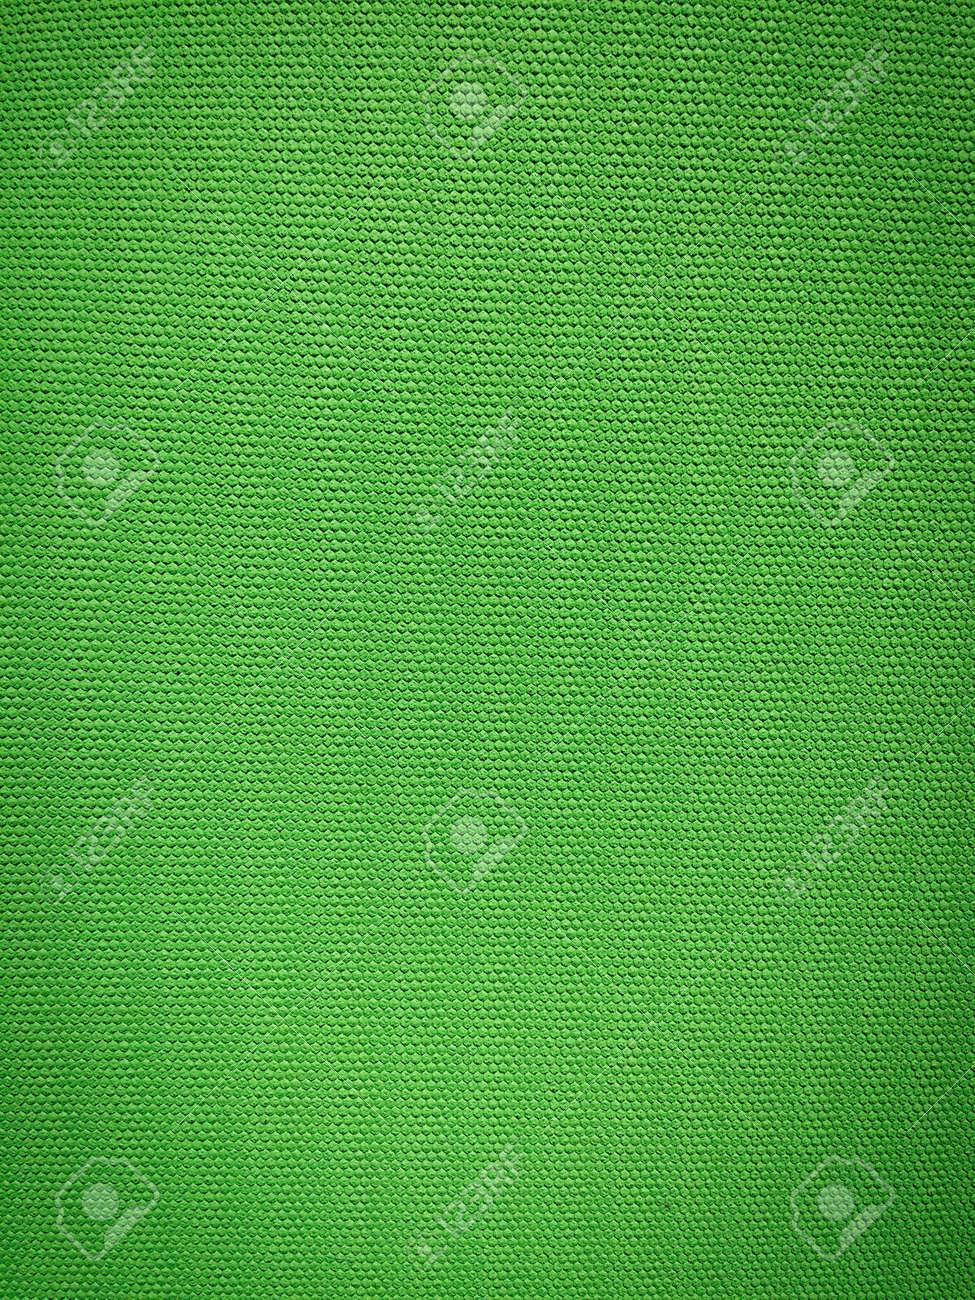 rubber surface rubber alloy granular texture bumpy texture green